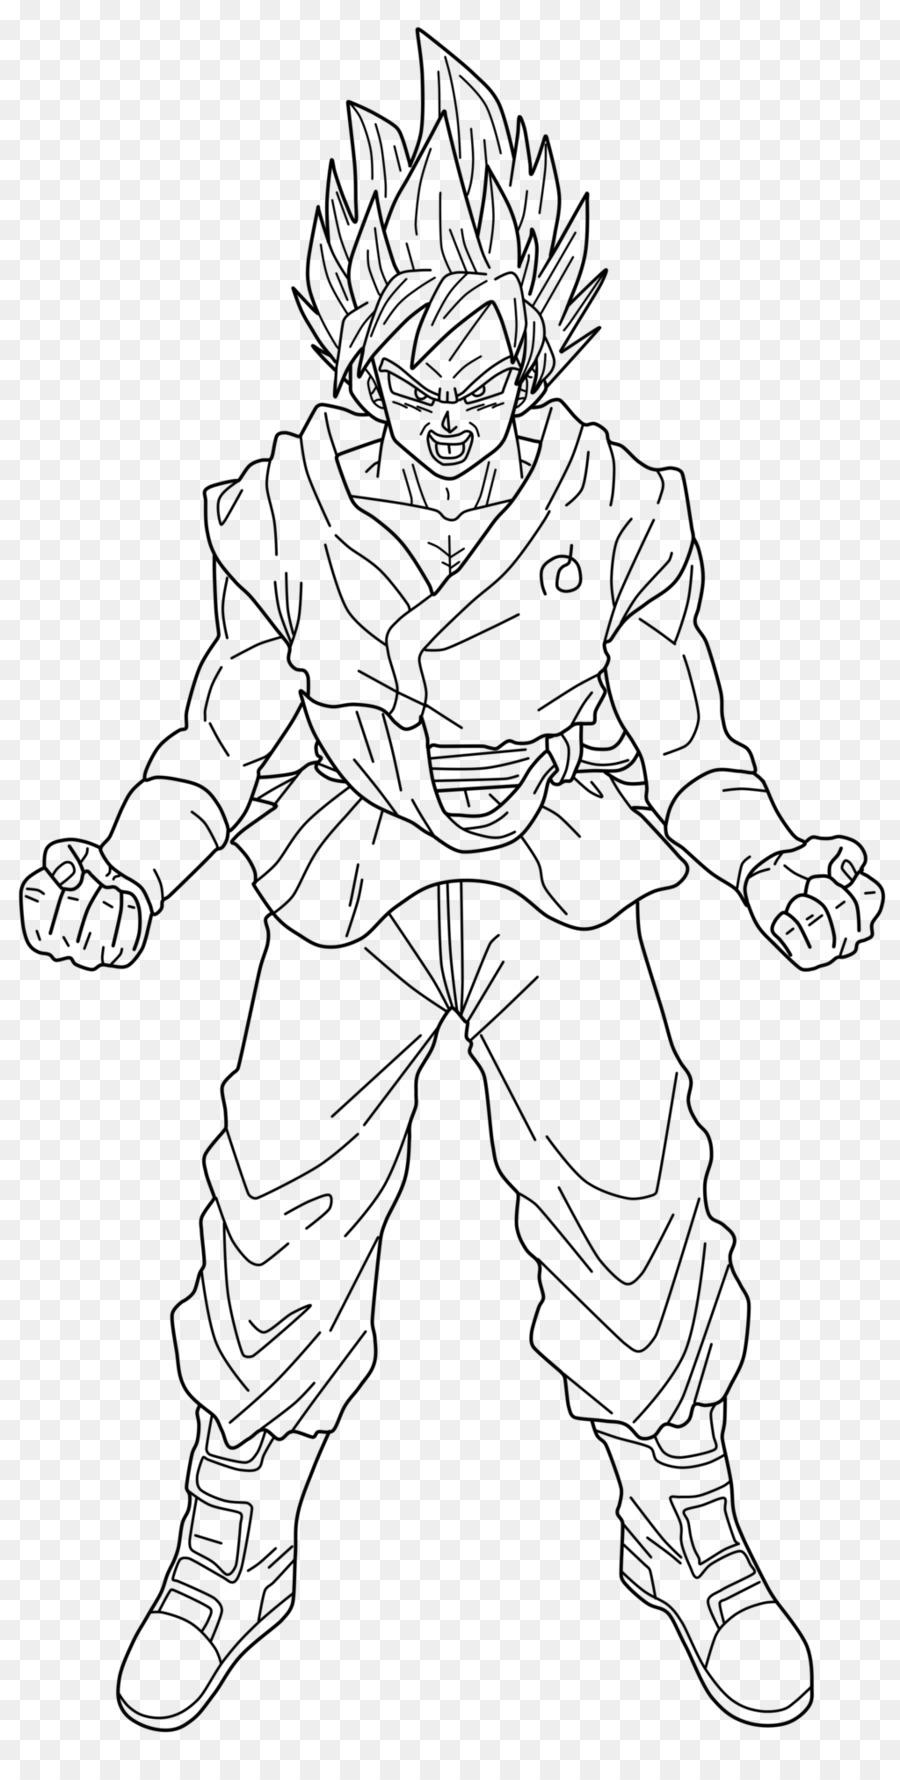 Line Art Goku Vegeta Super Saiyan Gogeta Goku Png Download 1024